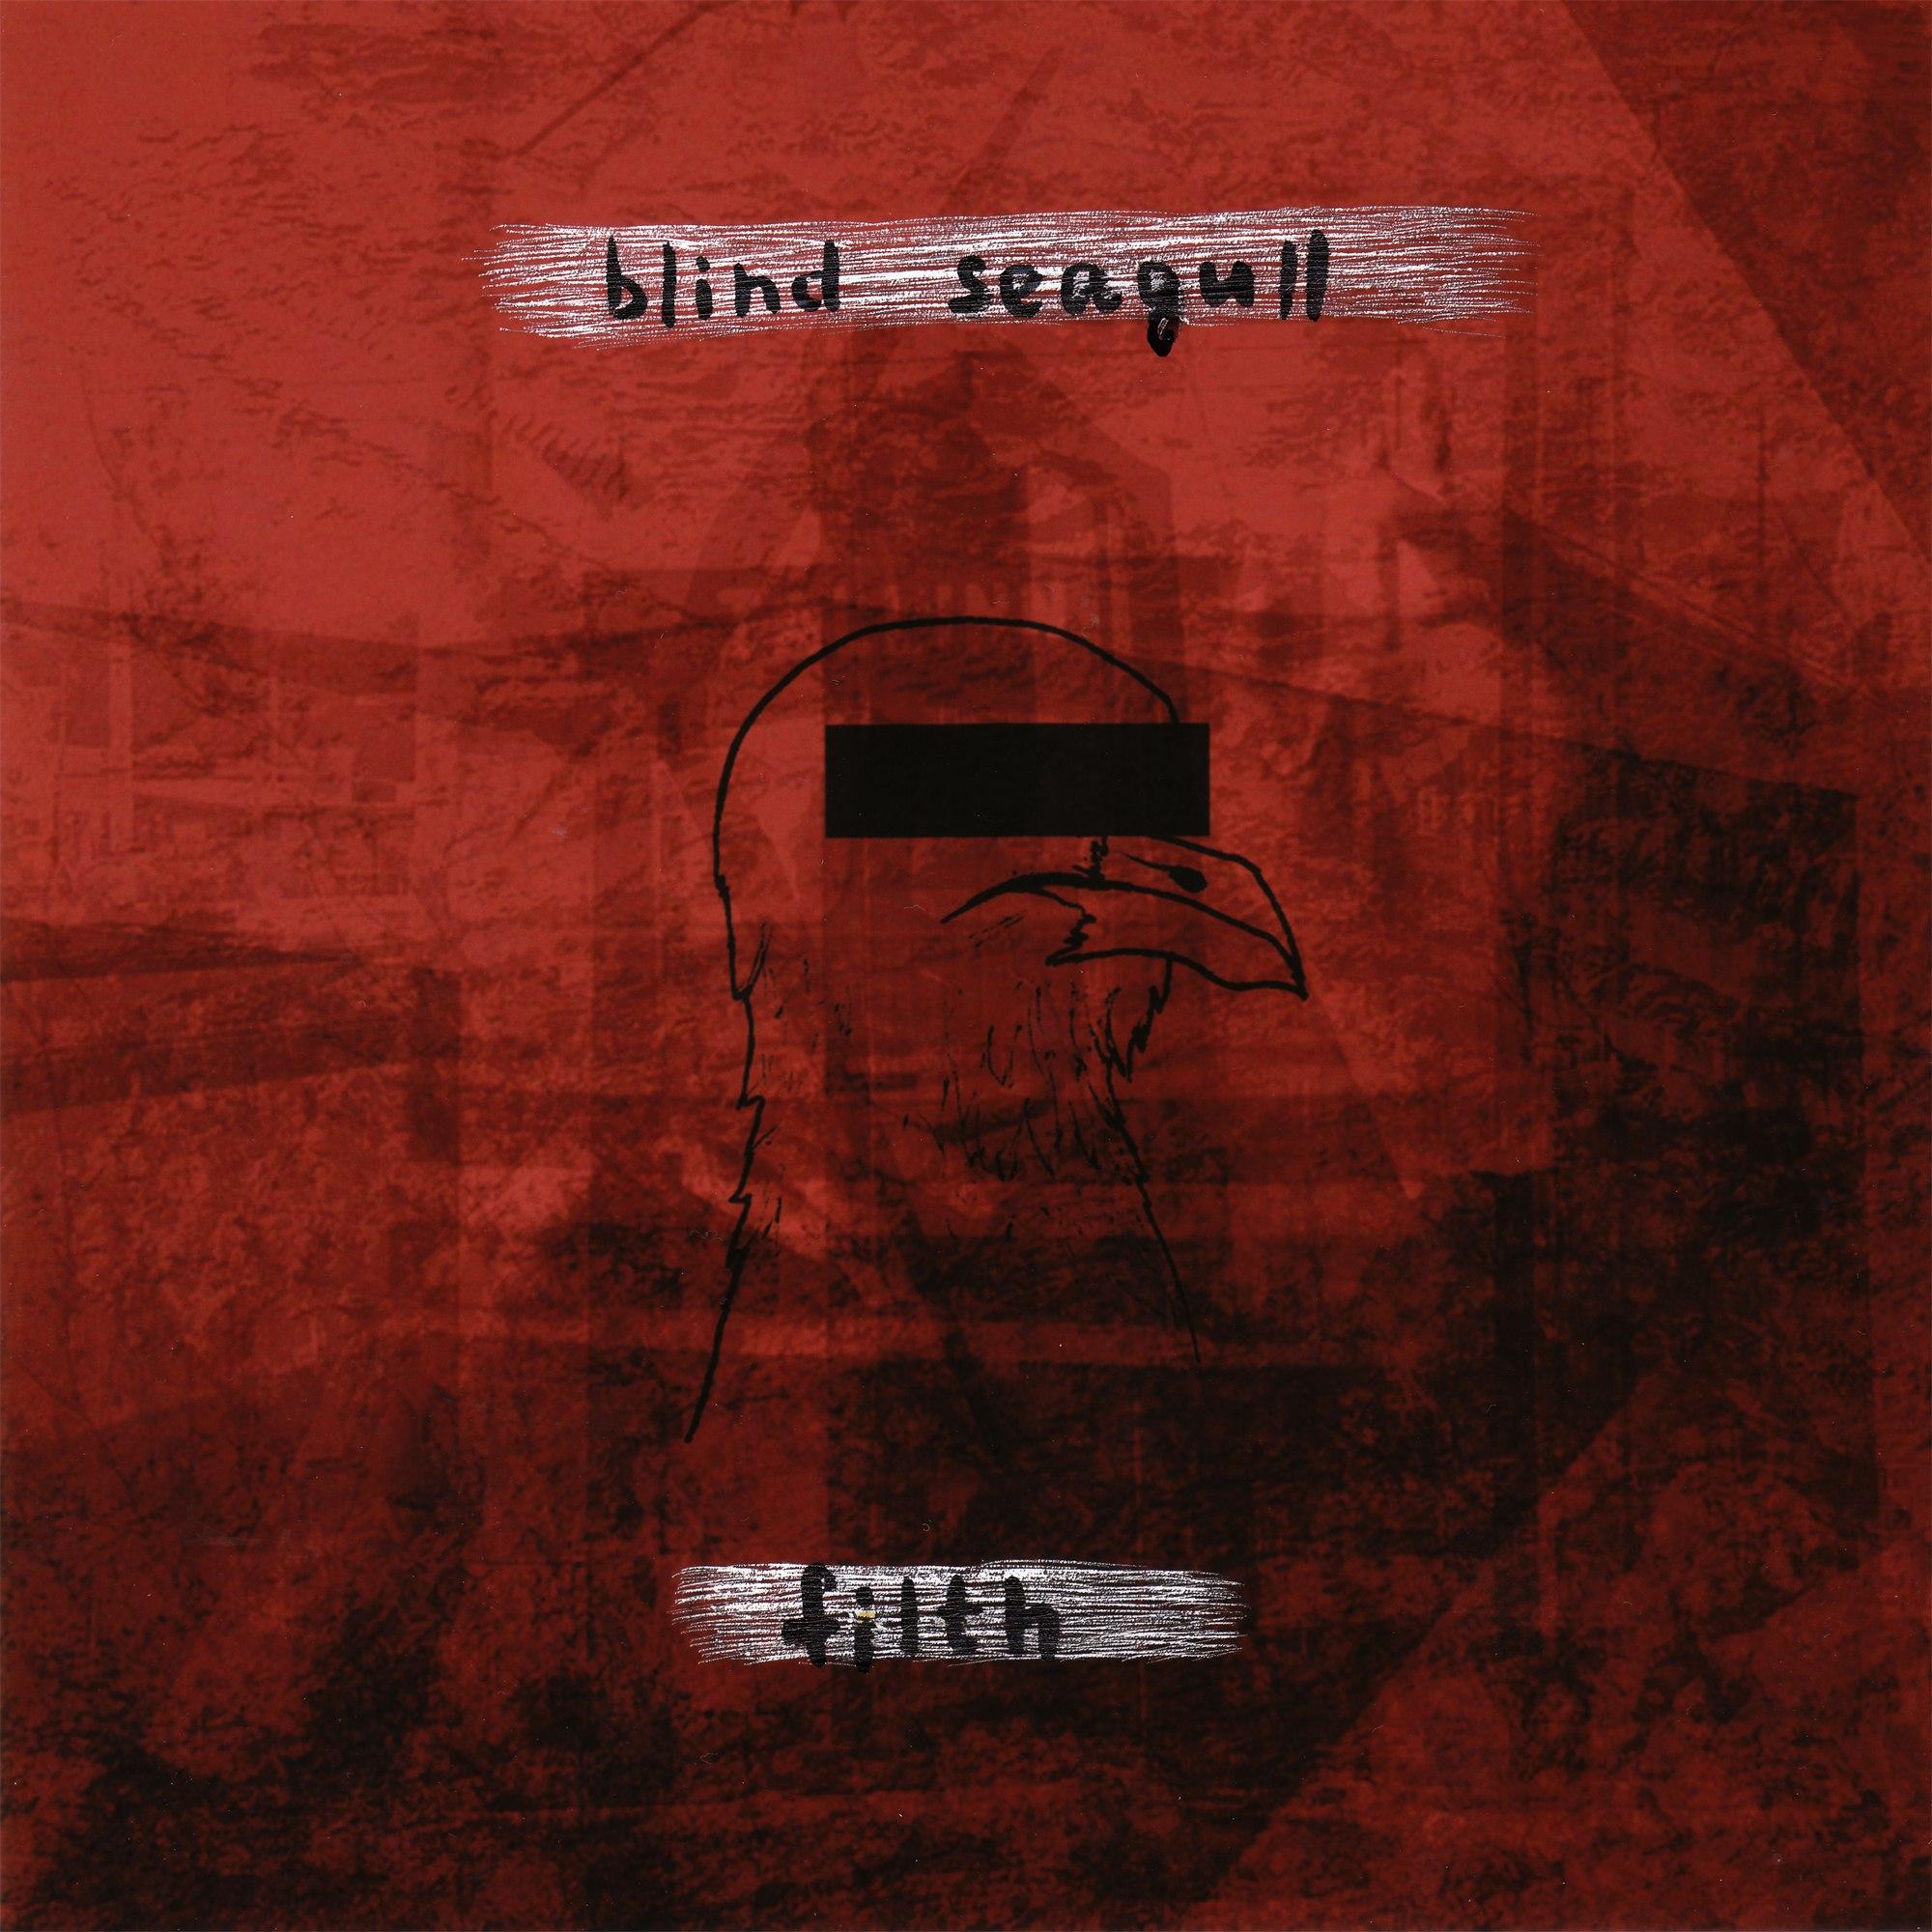 Blind Seagull - Ruined